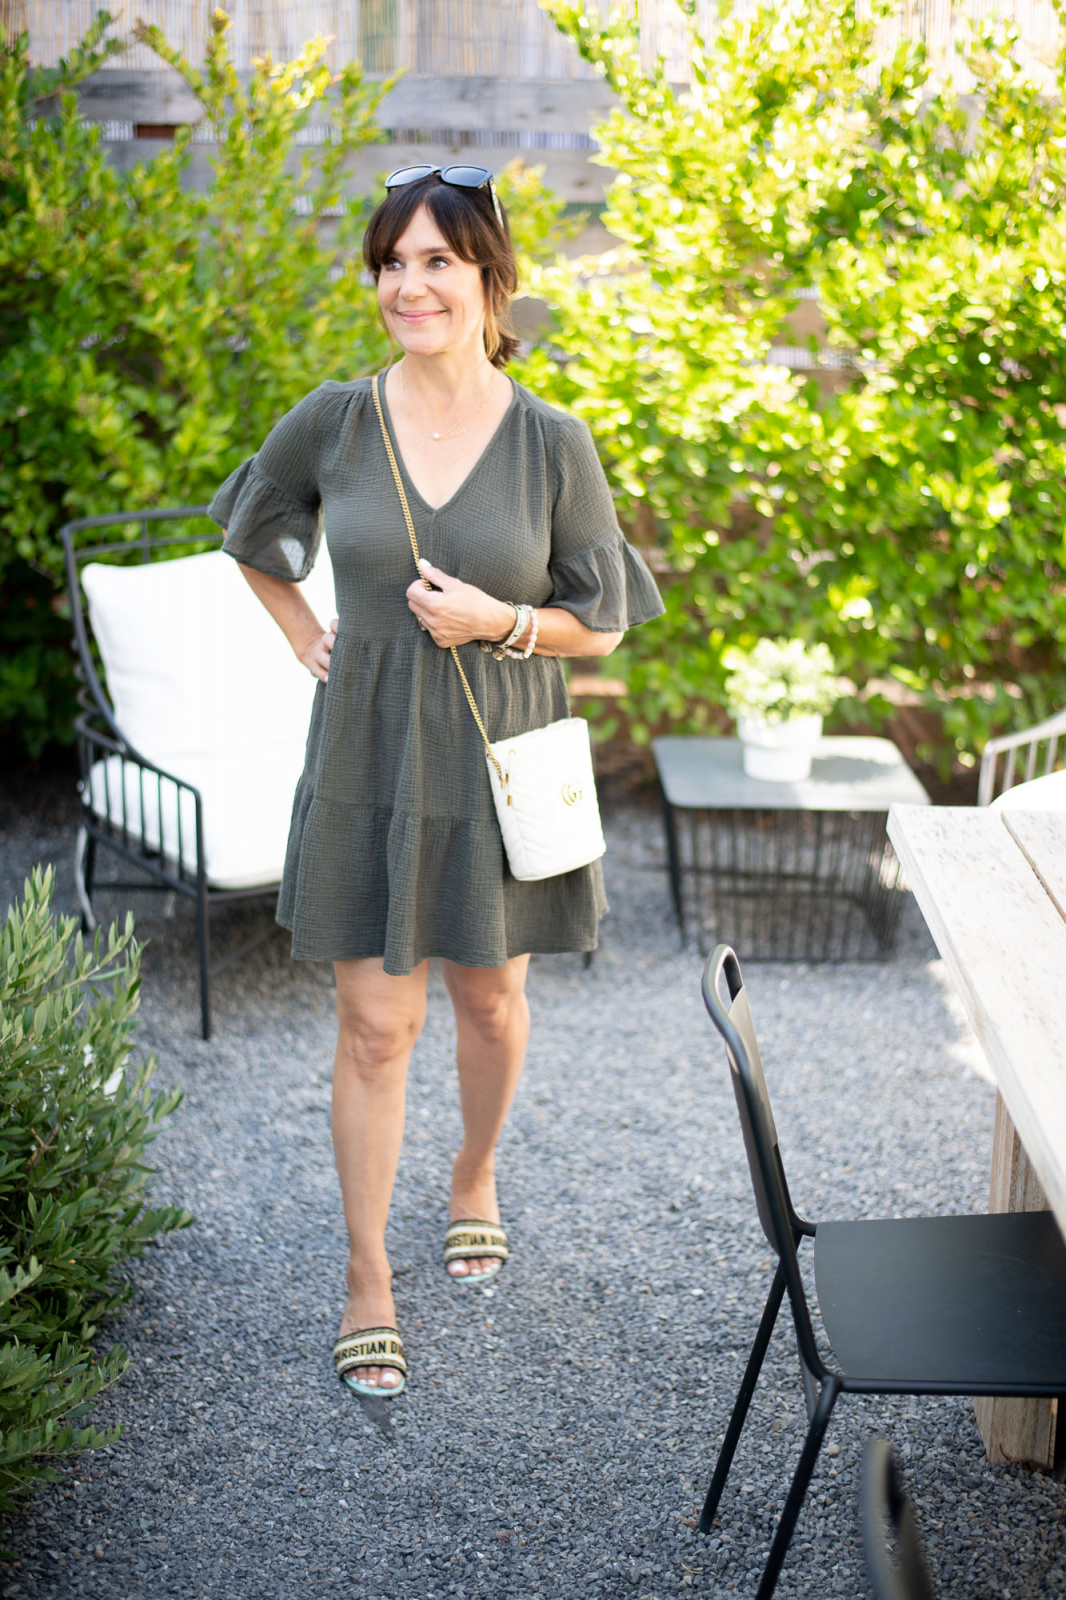 Velvet gauze dress, Dior slides, Gucci handbag